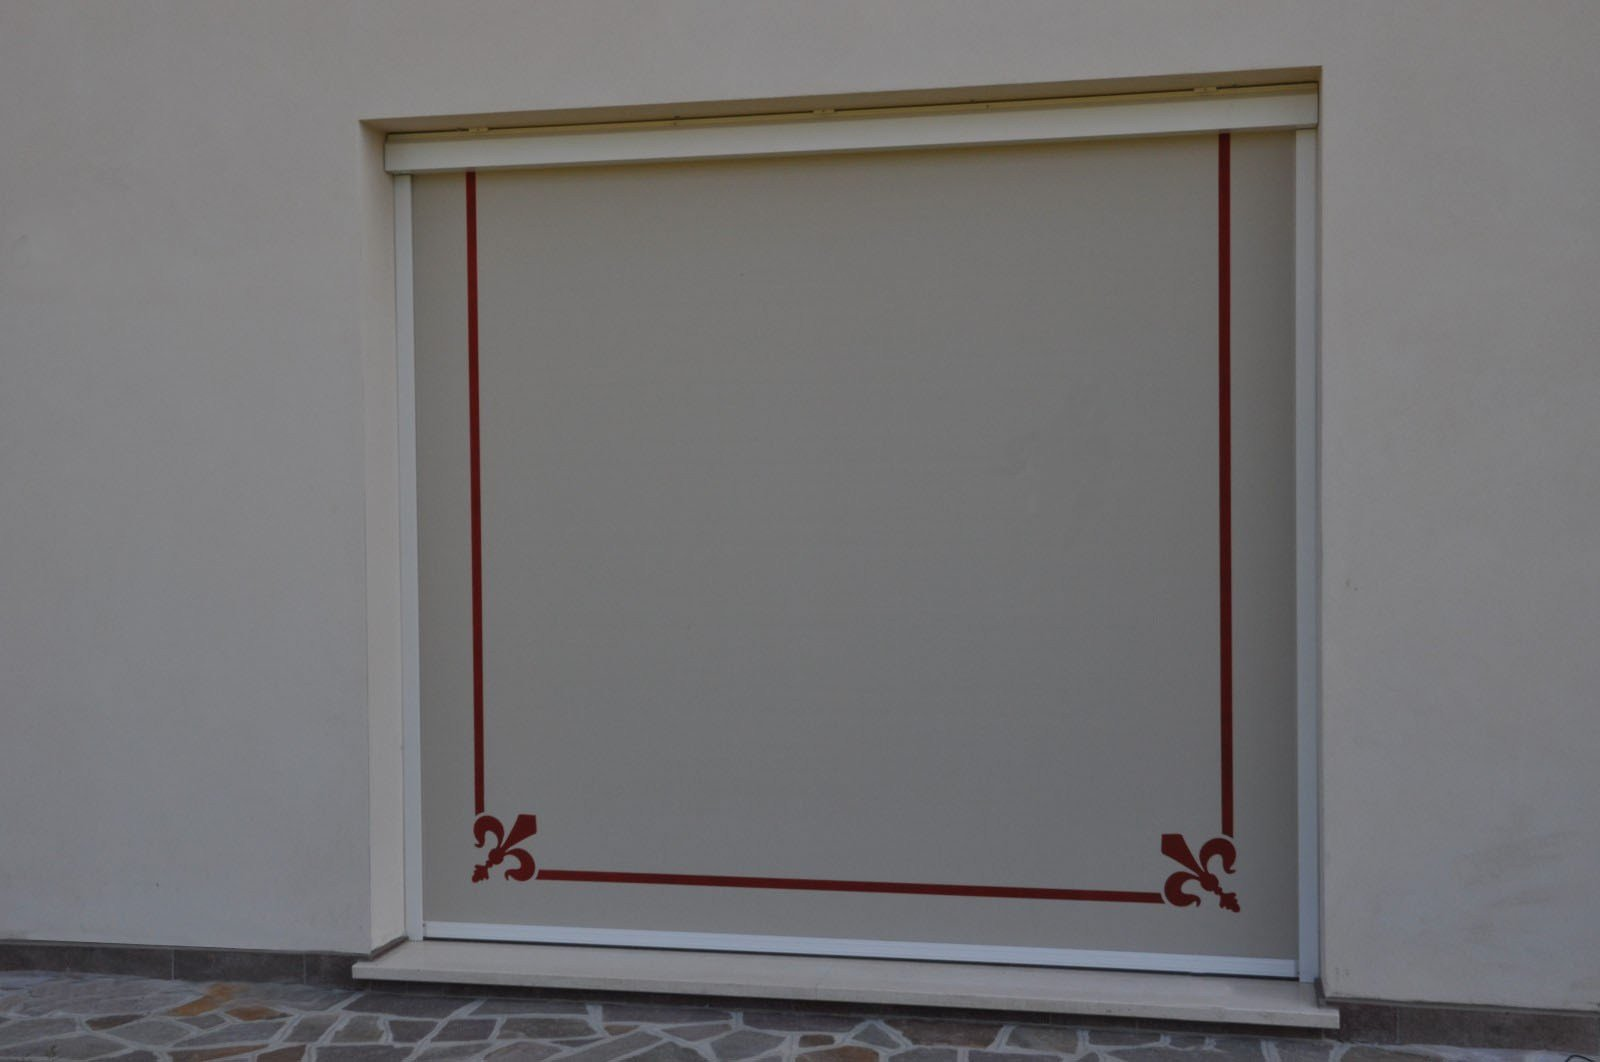 Lampade per interni a parete - Tende esterni ikea ...